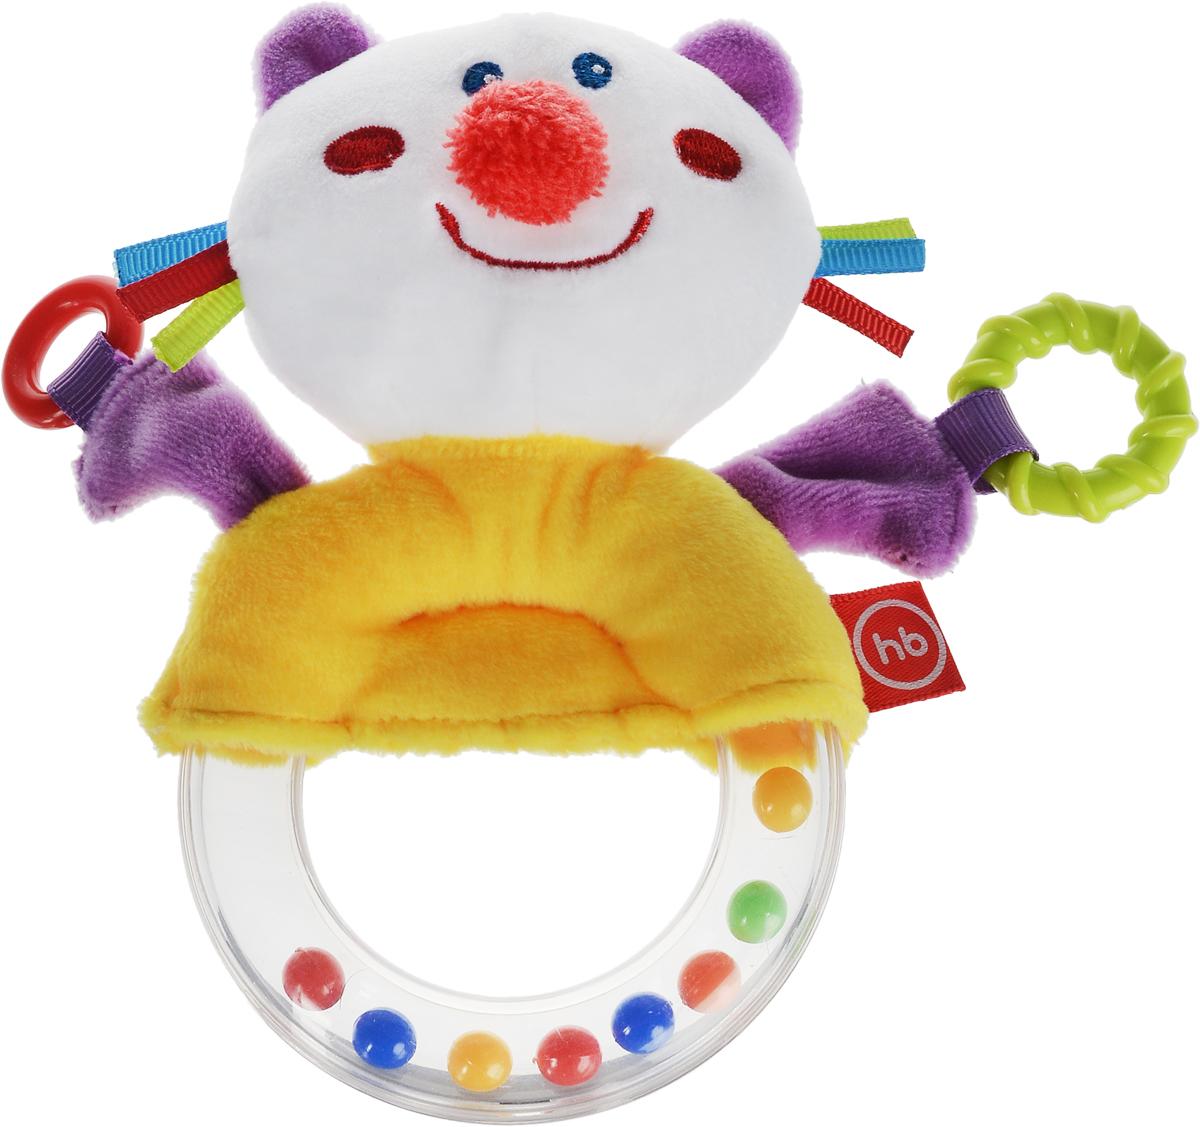 Happy Baby Погремушка-пищалка Funny Kitty happy baby погремушка прорезыватель музыкальная от 3 мес